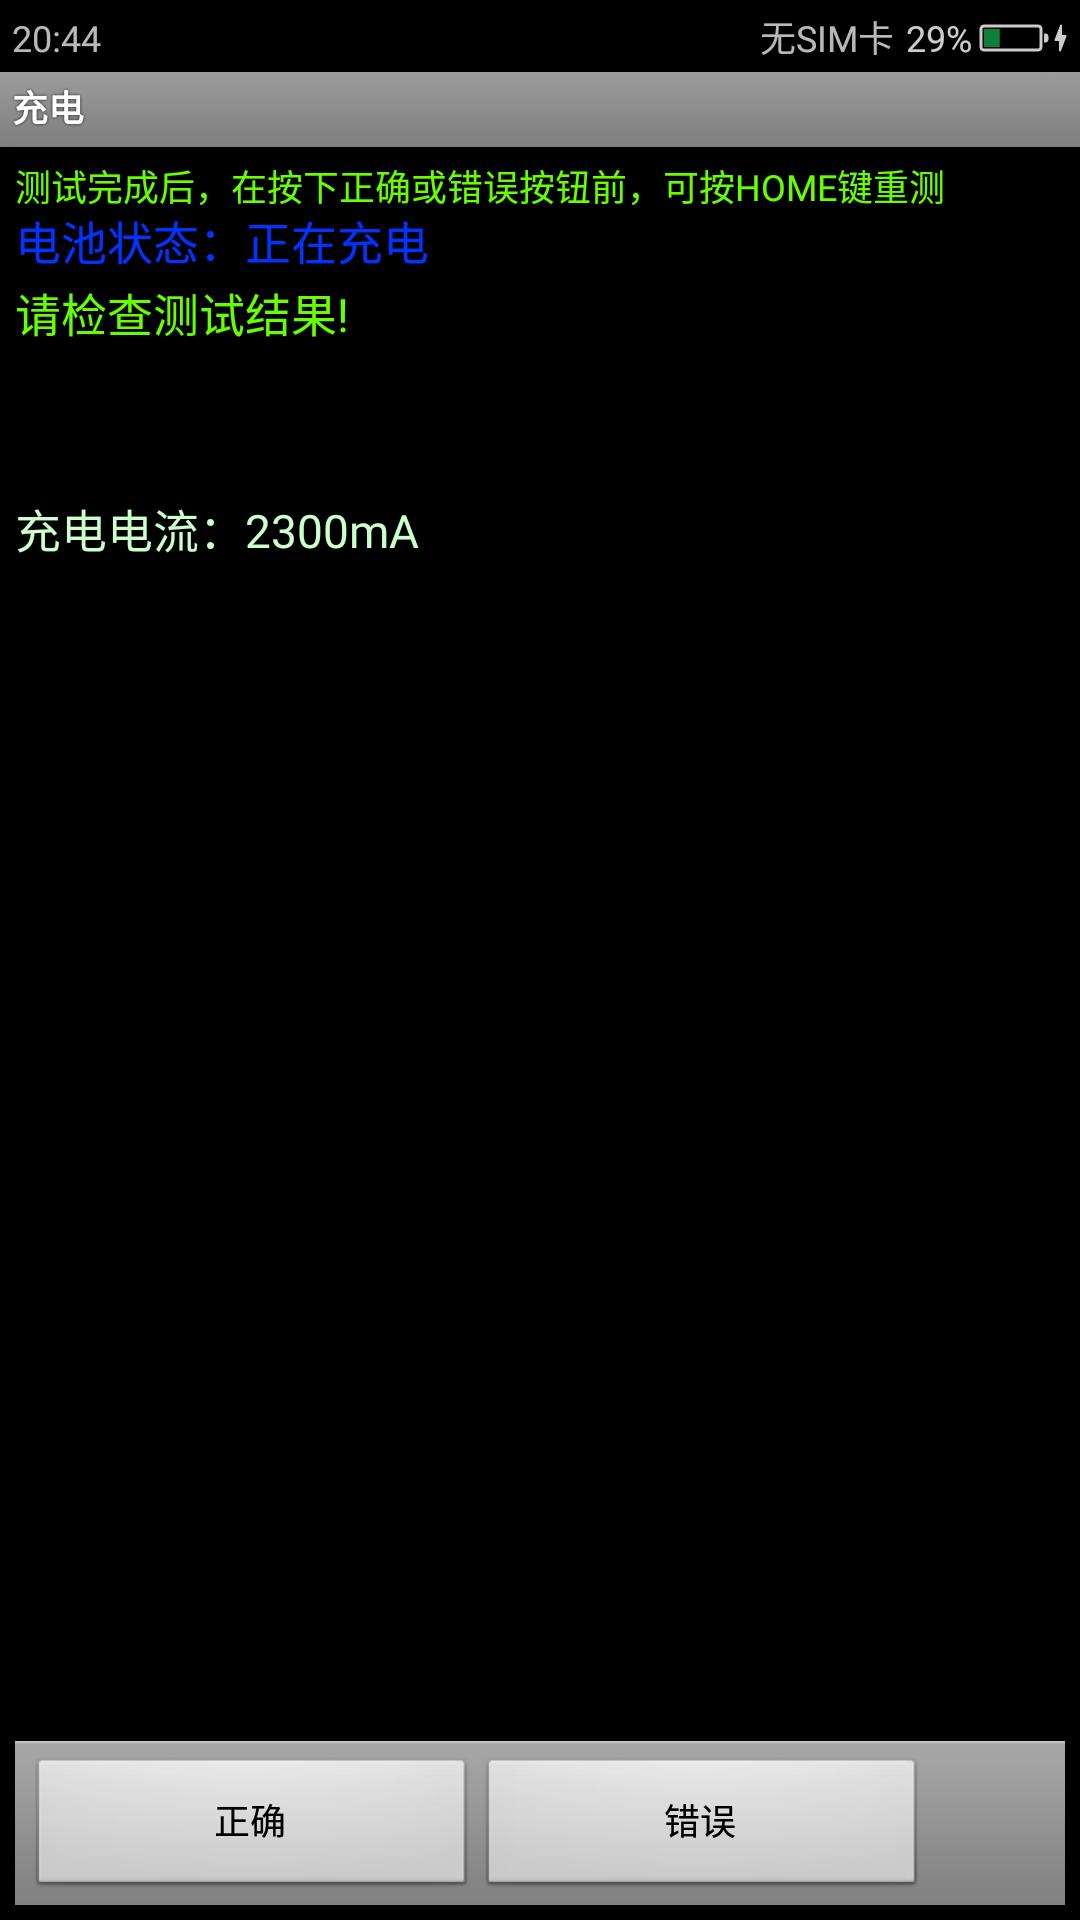 Screenshot_2018-11-15-20-44-11.png